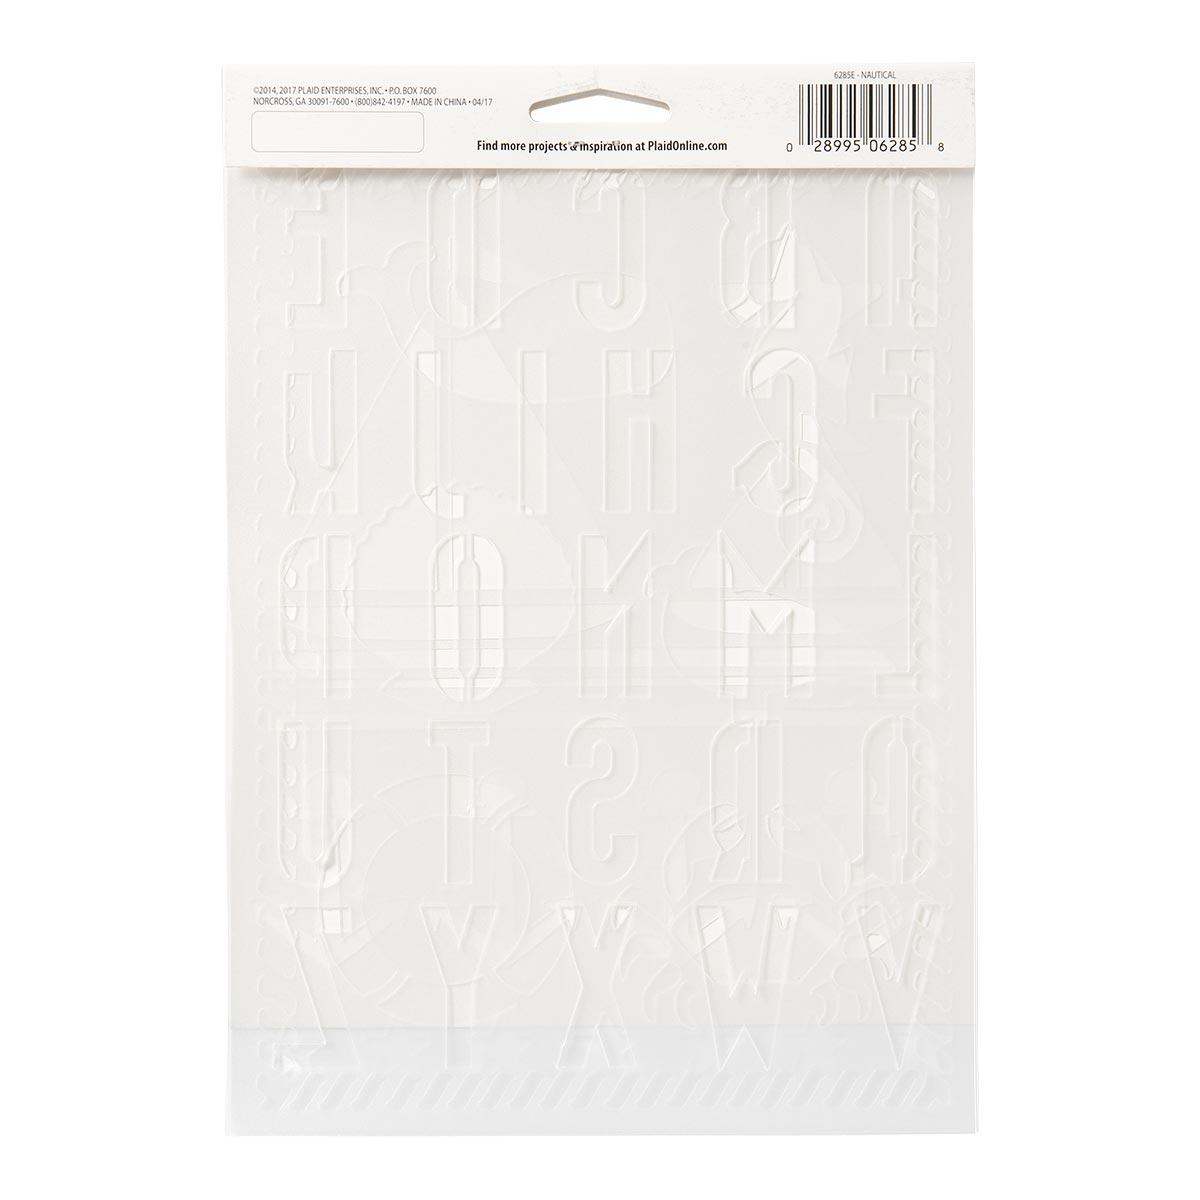 FolkArt ® Stencil Value Packs - Nautical, 7